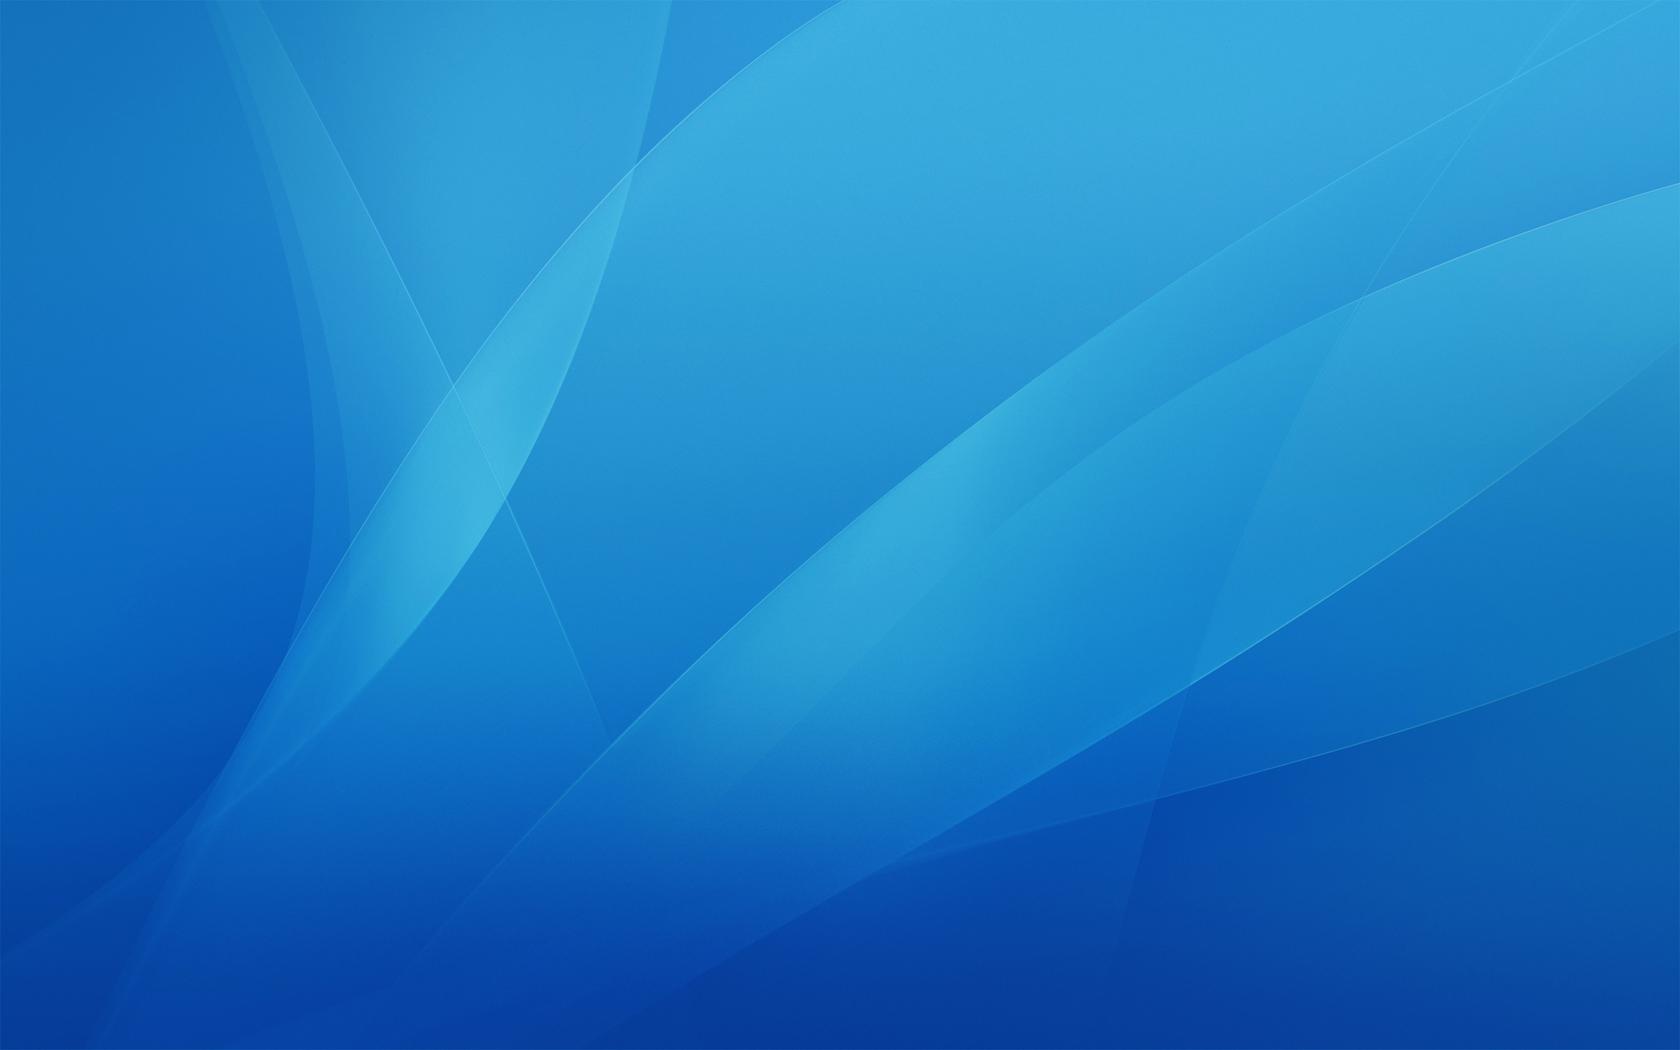 Wallpaper Light Blue